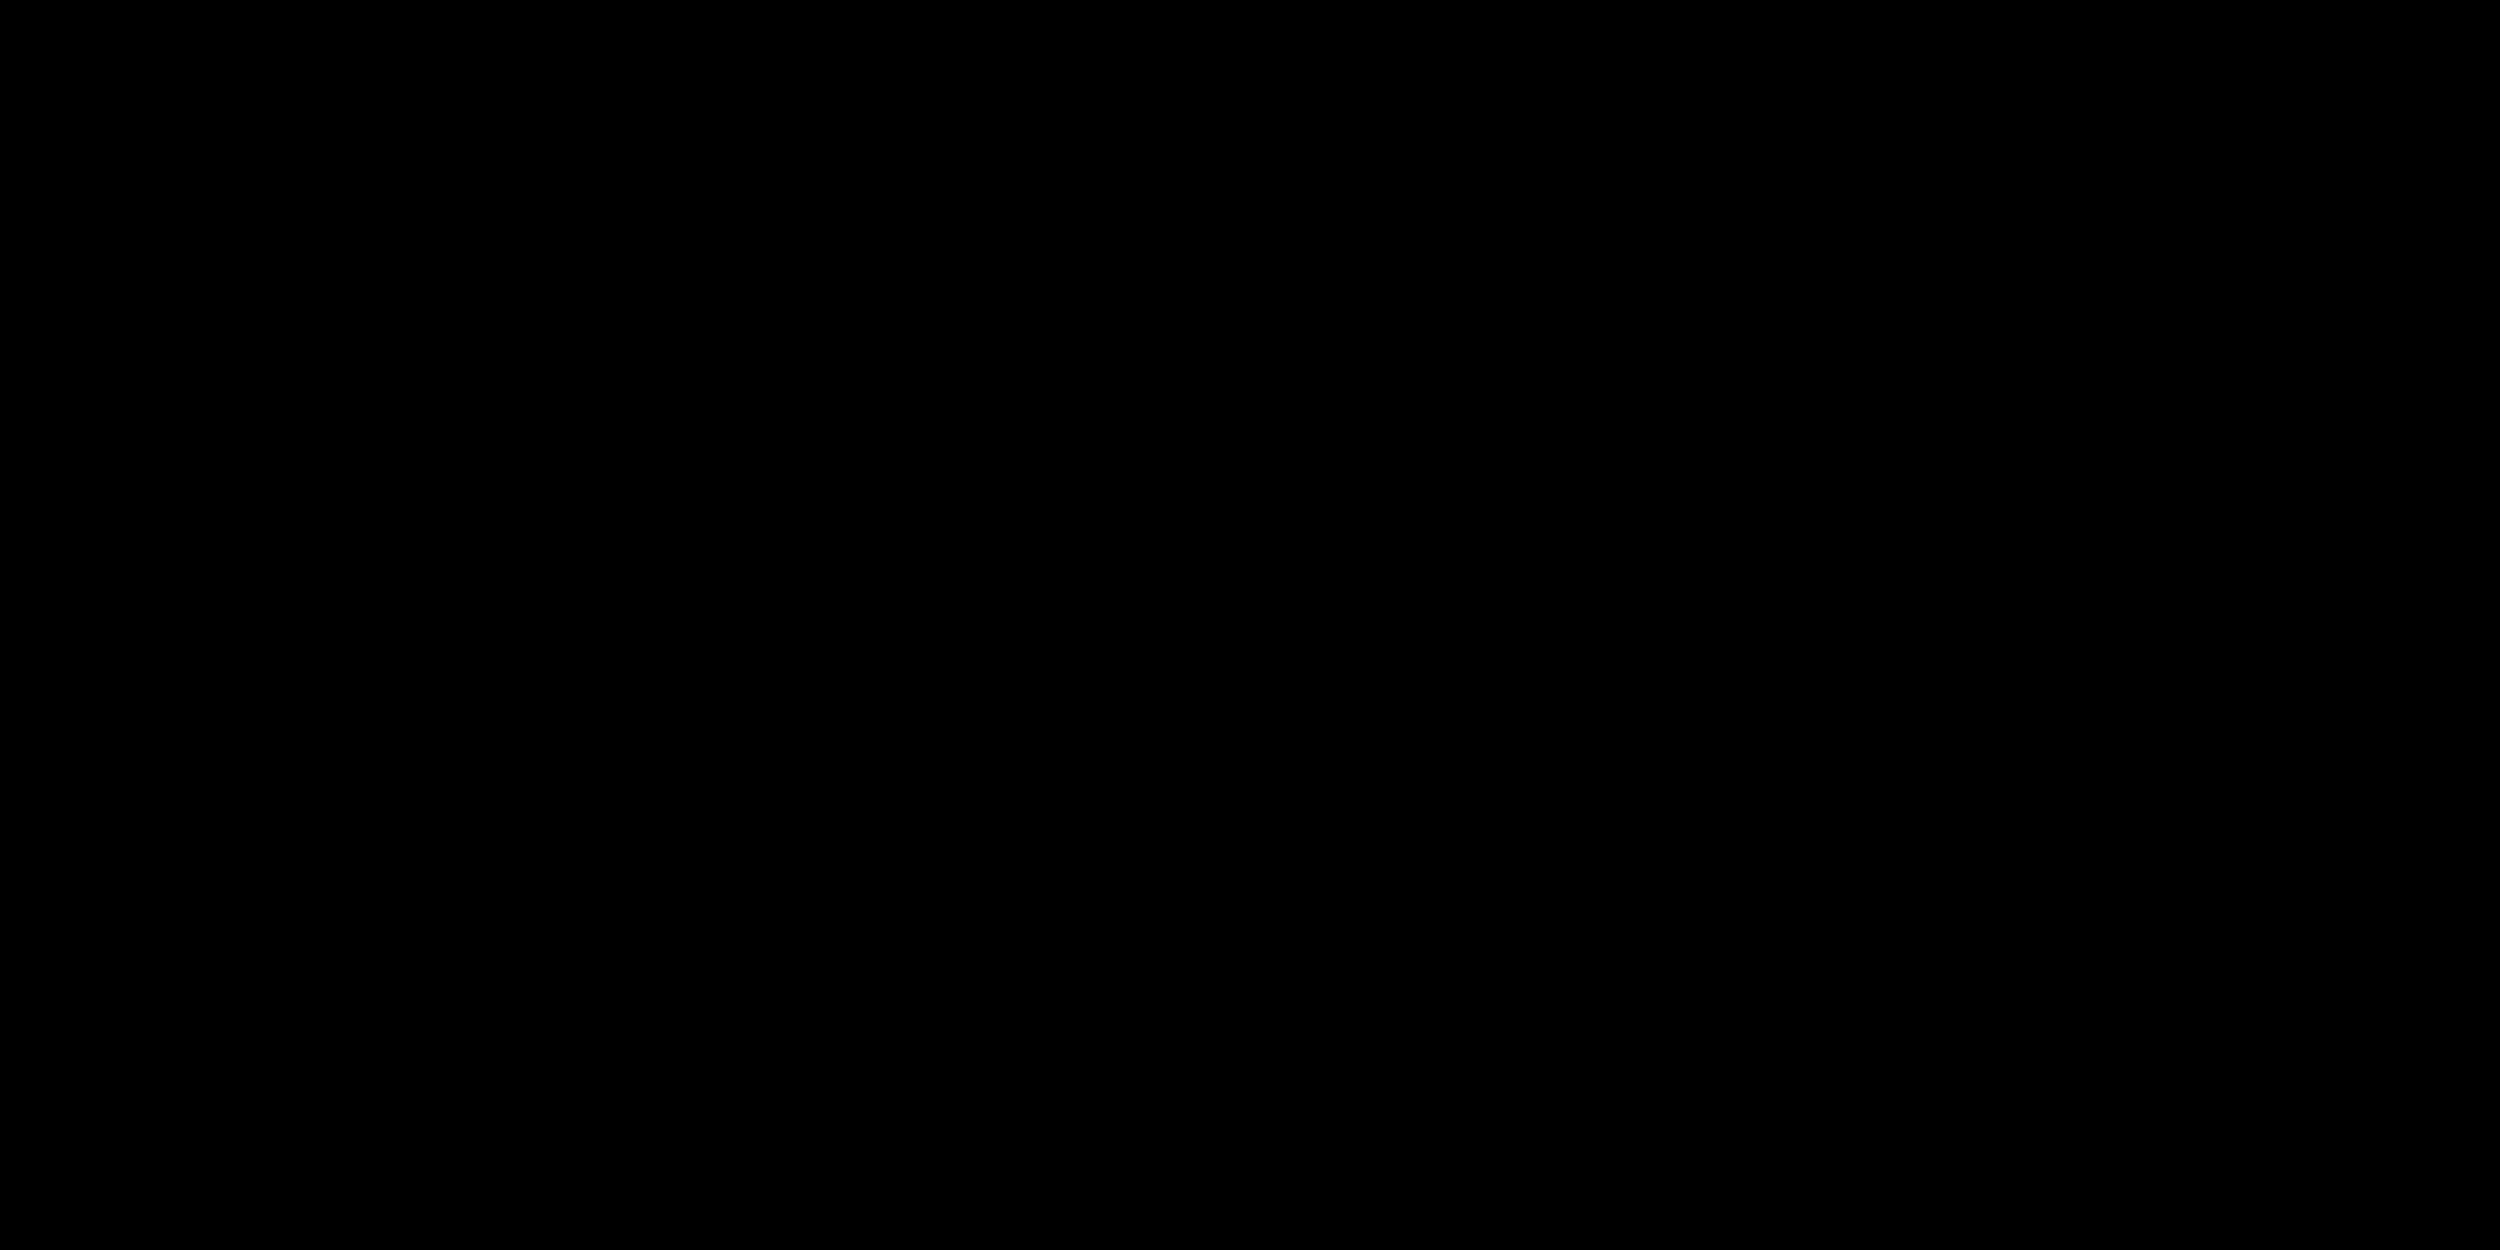 Panel Bottom 21